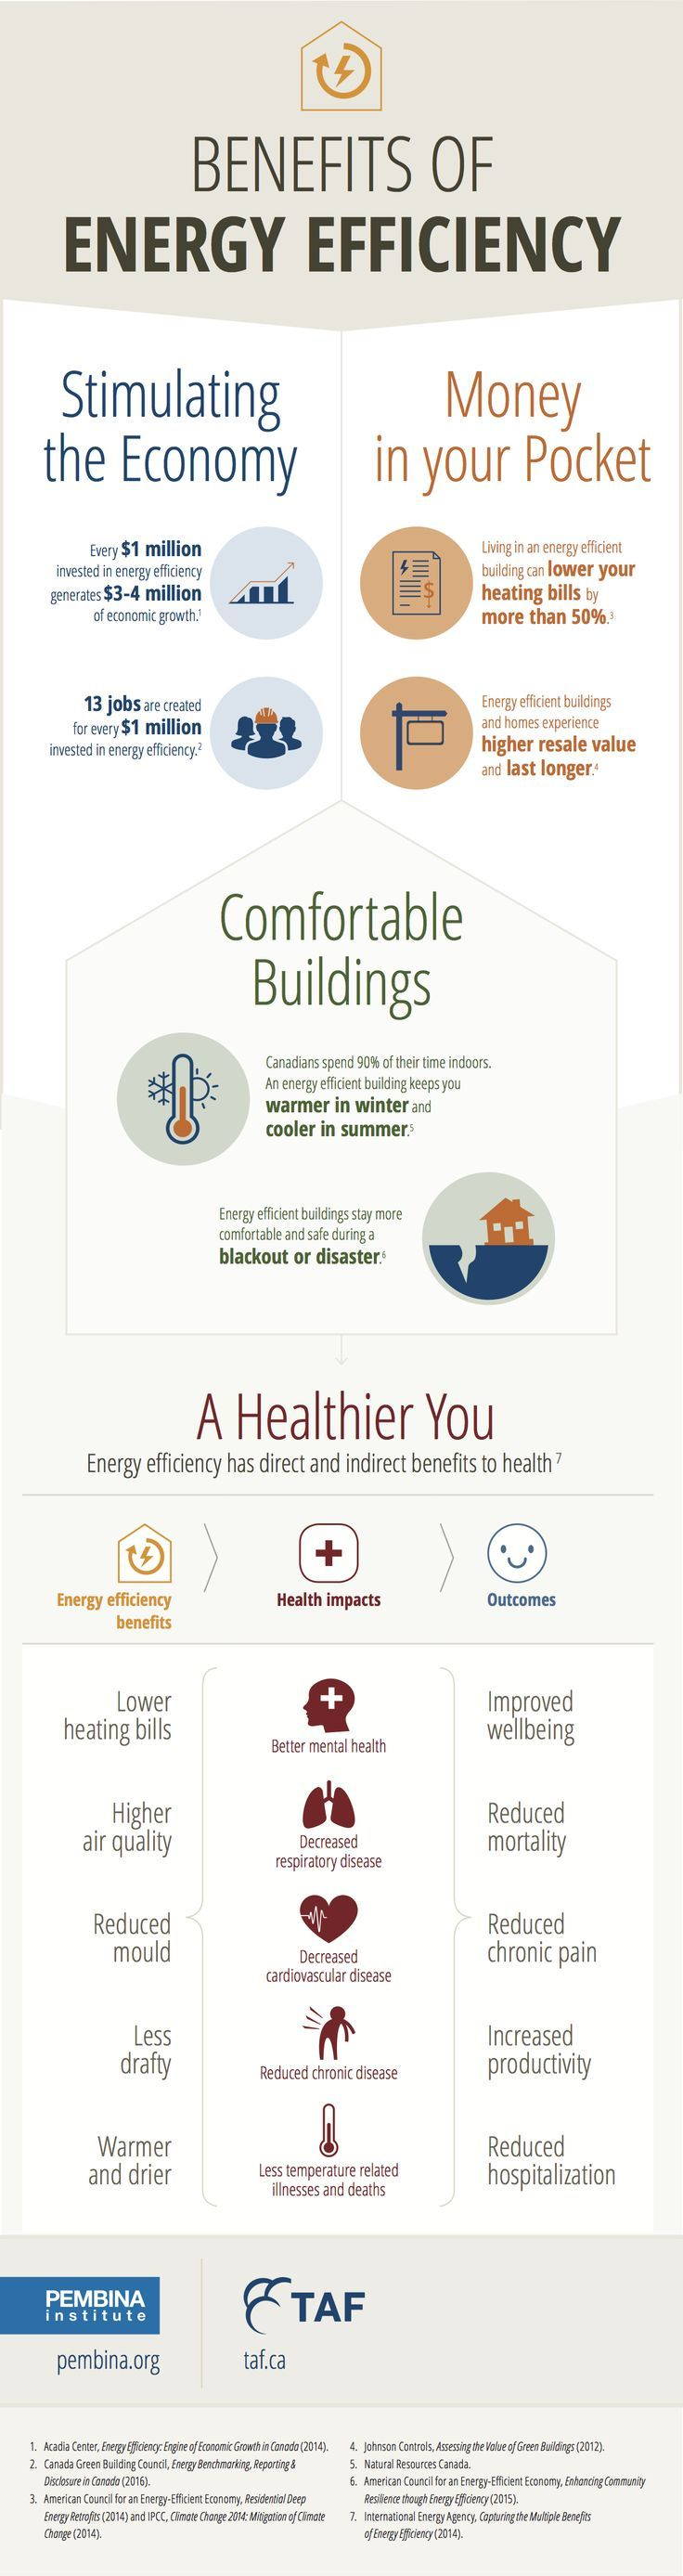 42 best Energy Efficiency Visuals images on Pinterest ...